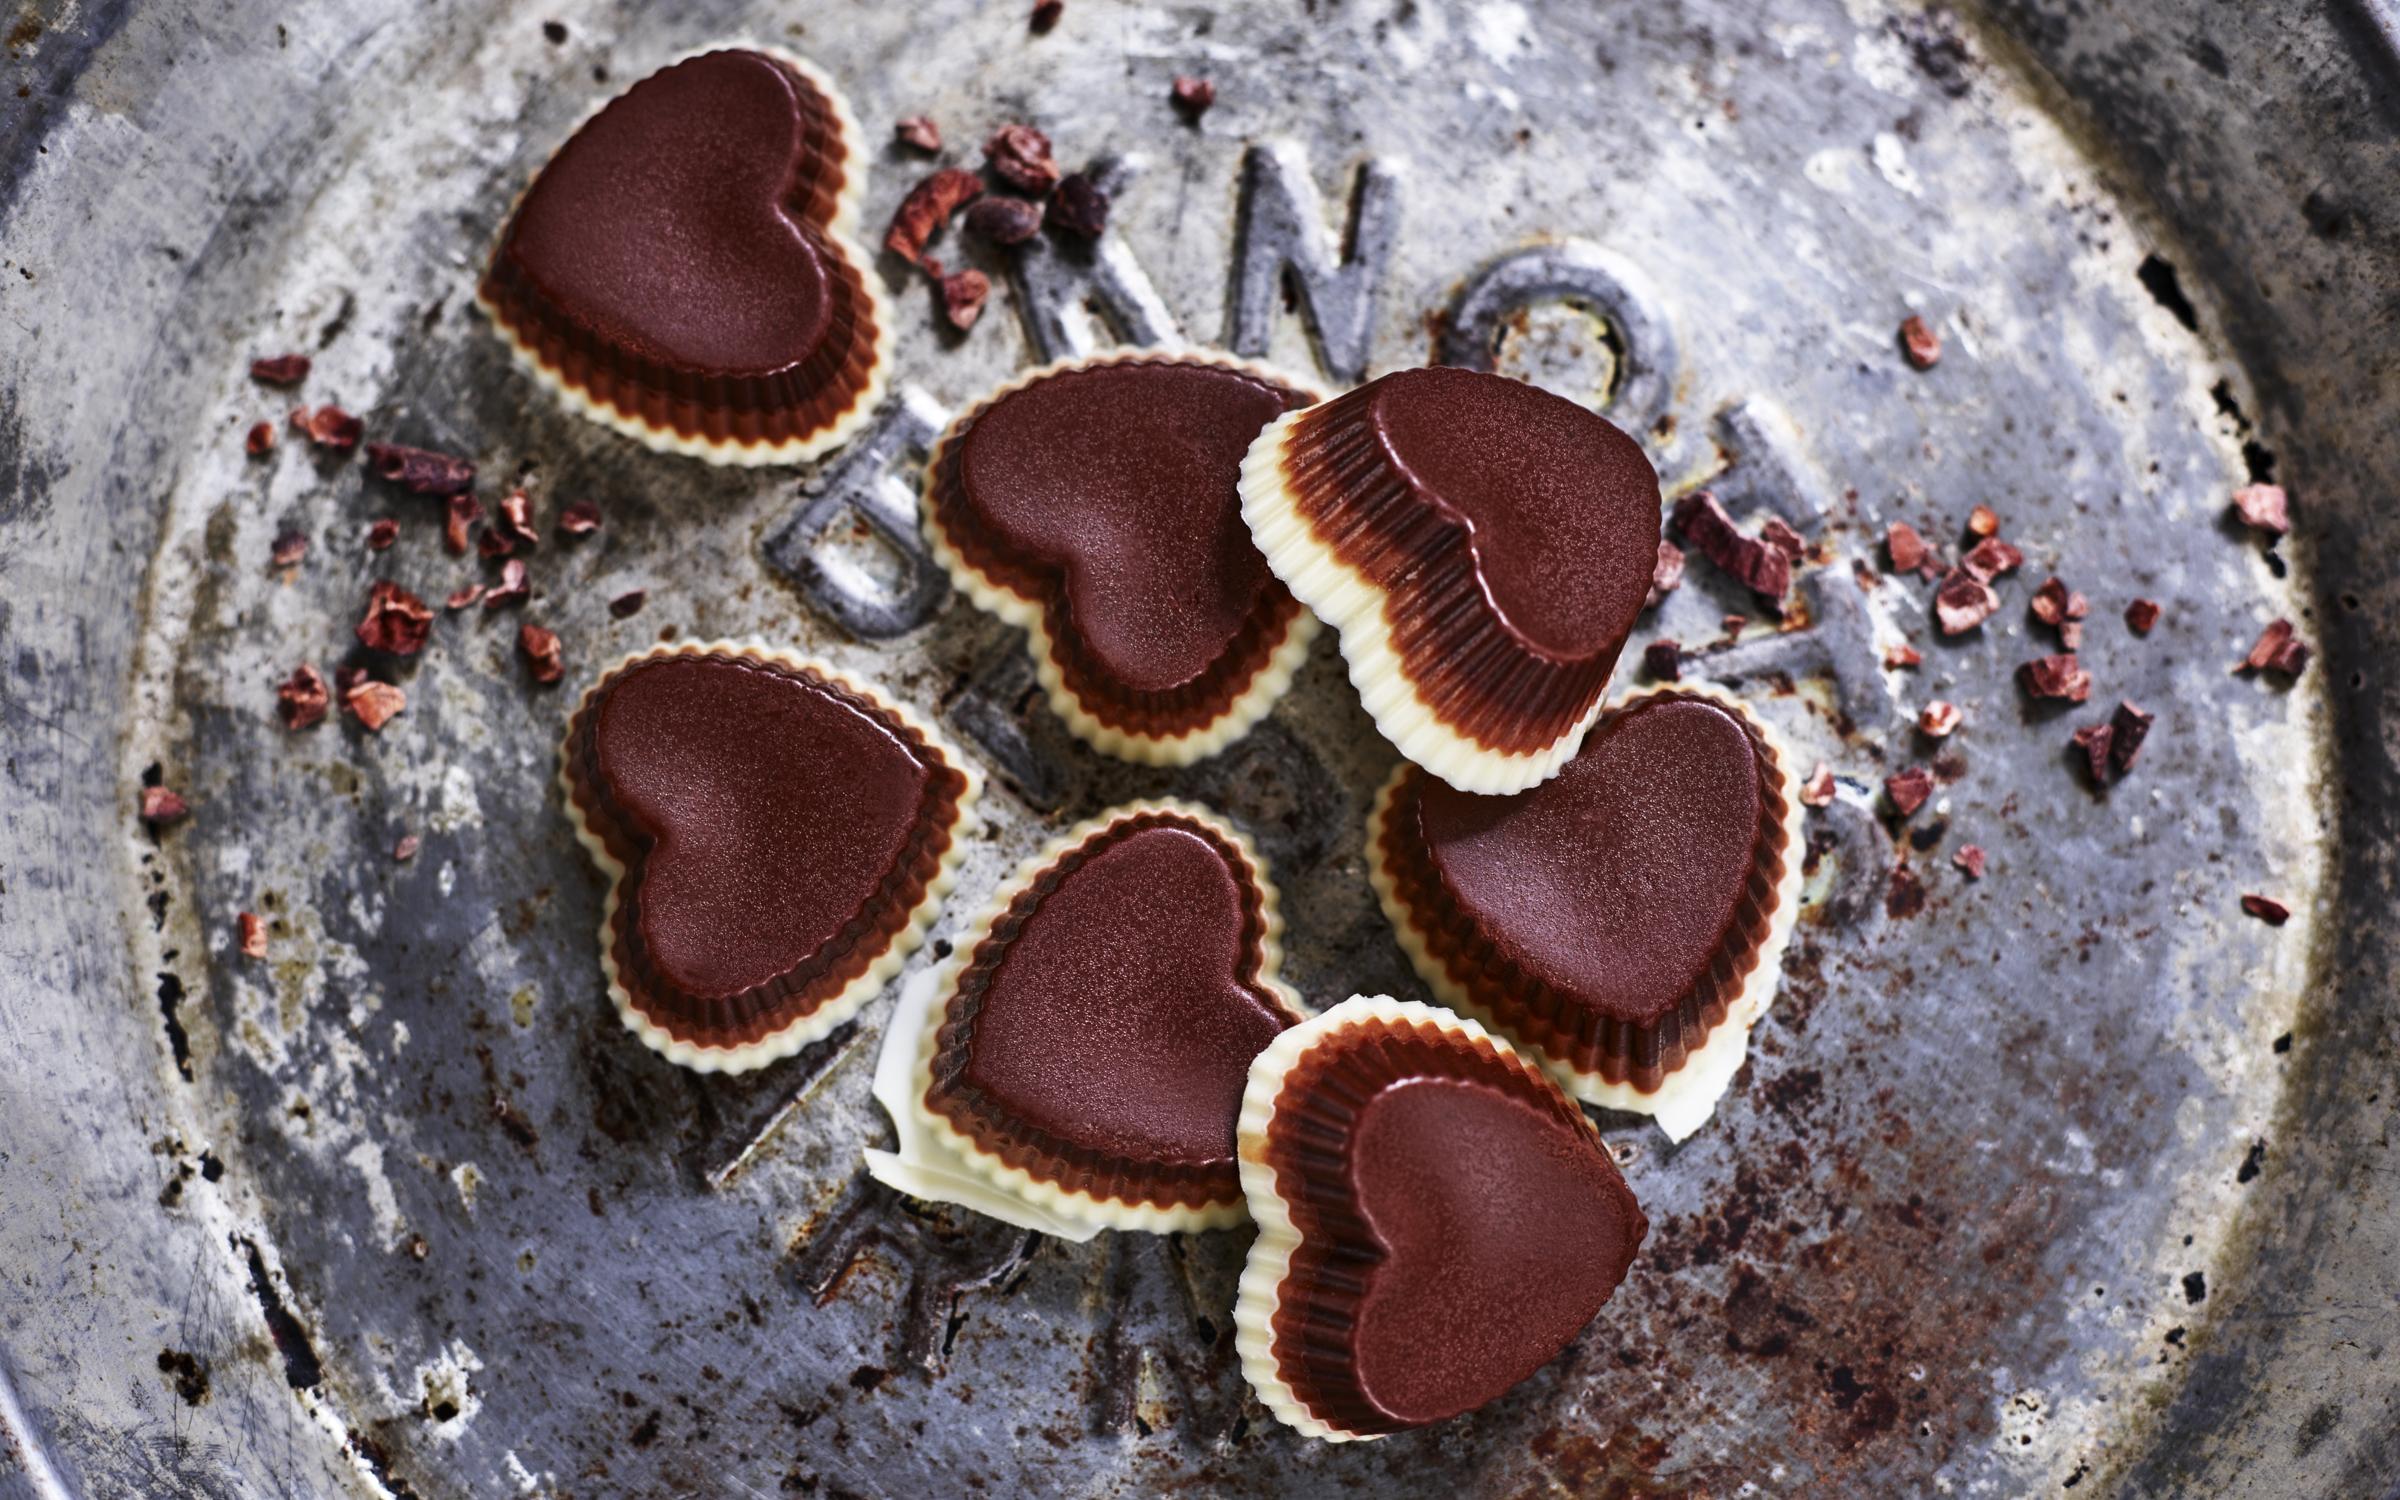 ischoklad recept arla